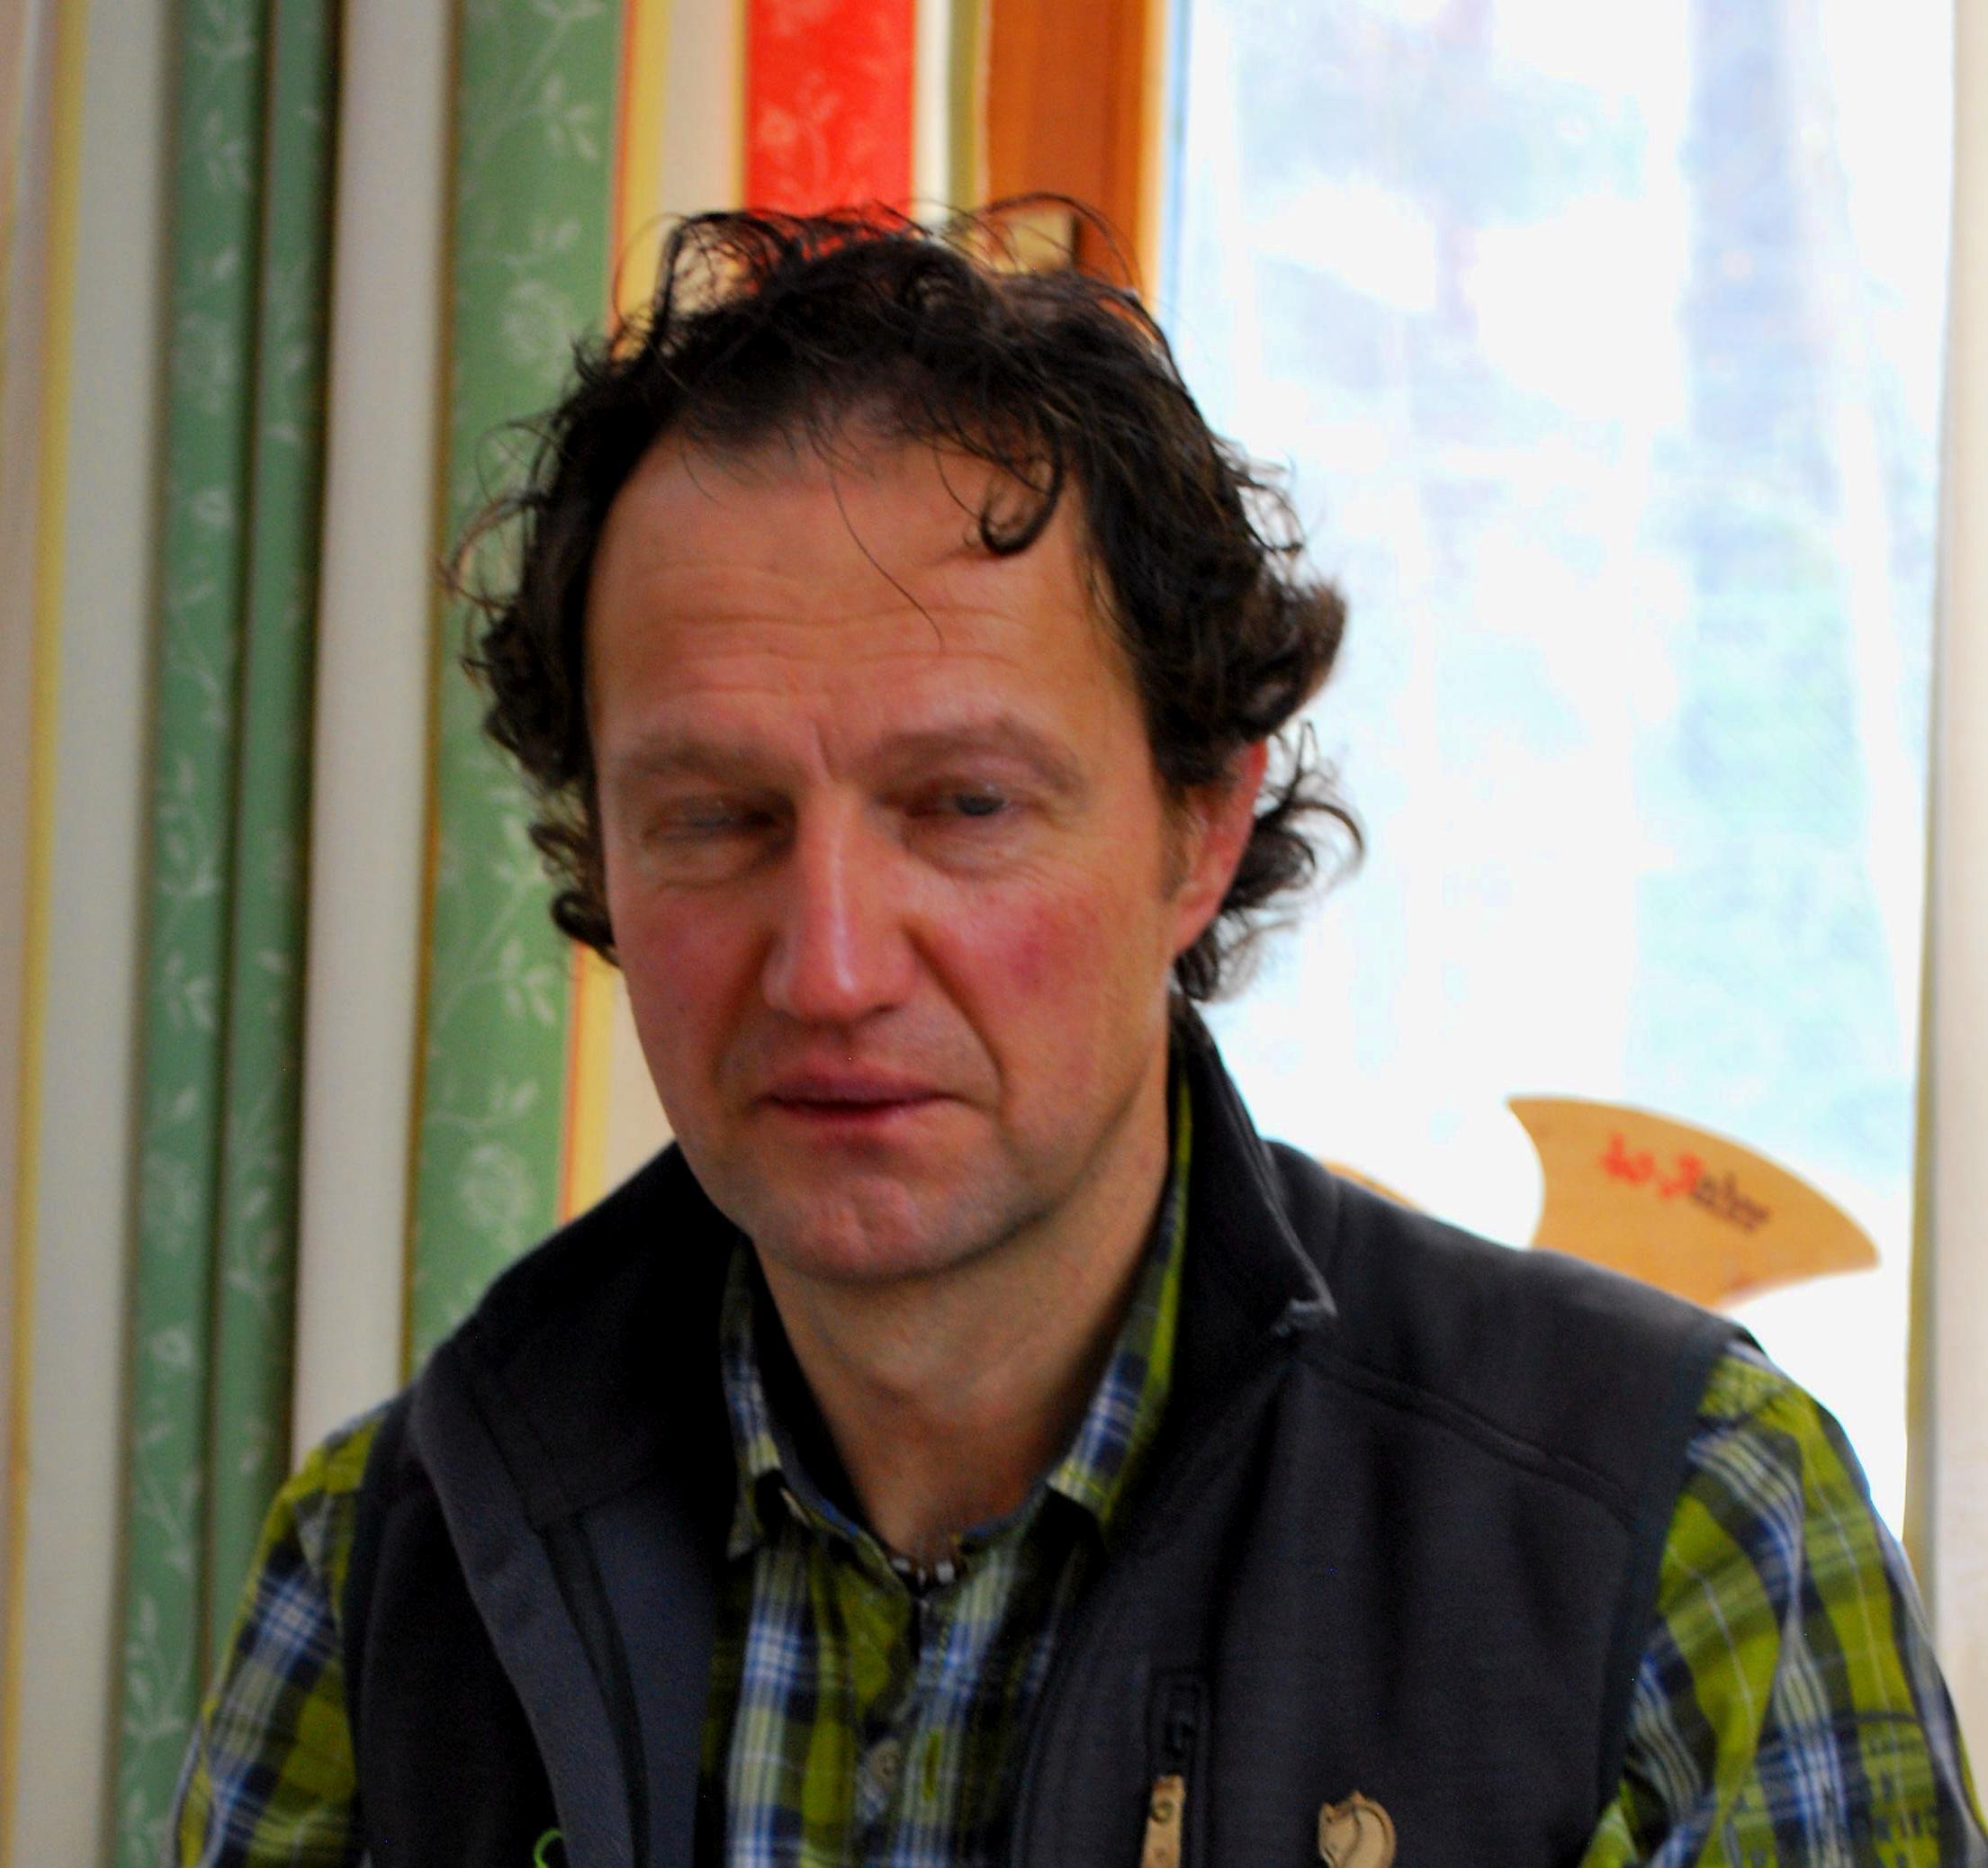 Martin Seits